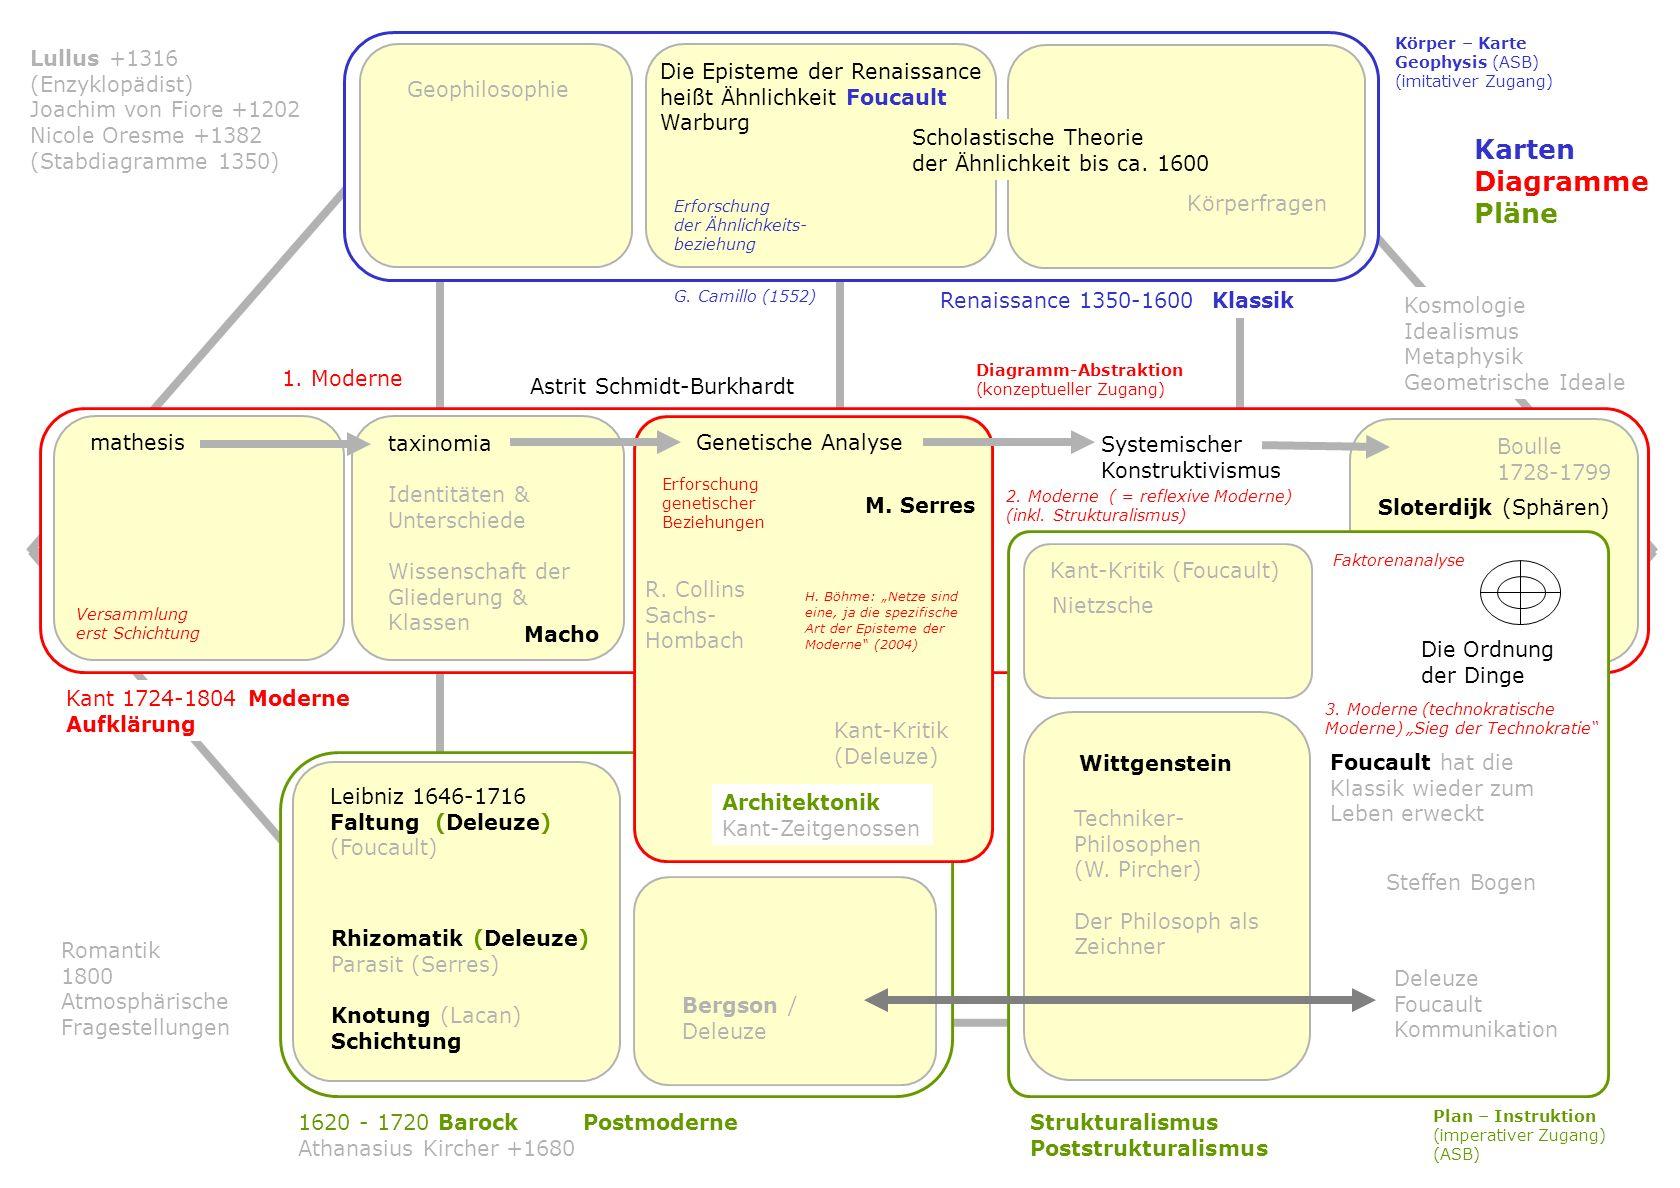 S Entwicklungsbänder N003 N120 Entwicklungslinie N007 Baumdiagramme Kategorienbäume N125/4 N038 Genealogien F Knollennetze N091/5 N246 N091/x Wurzelne